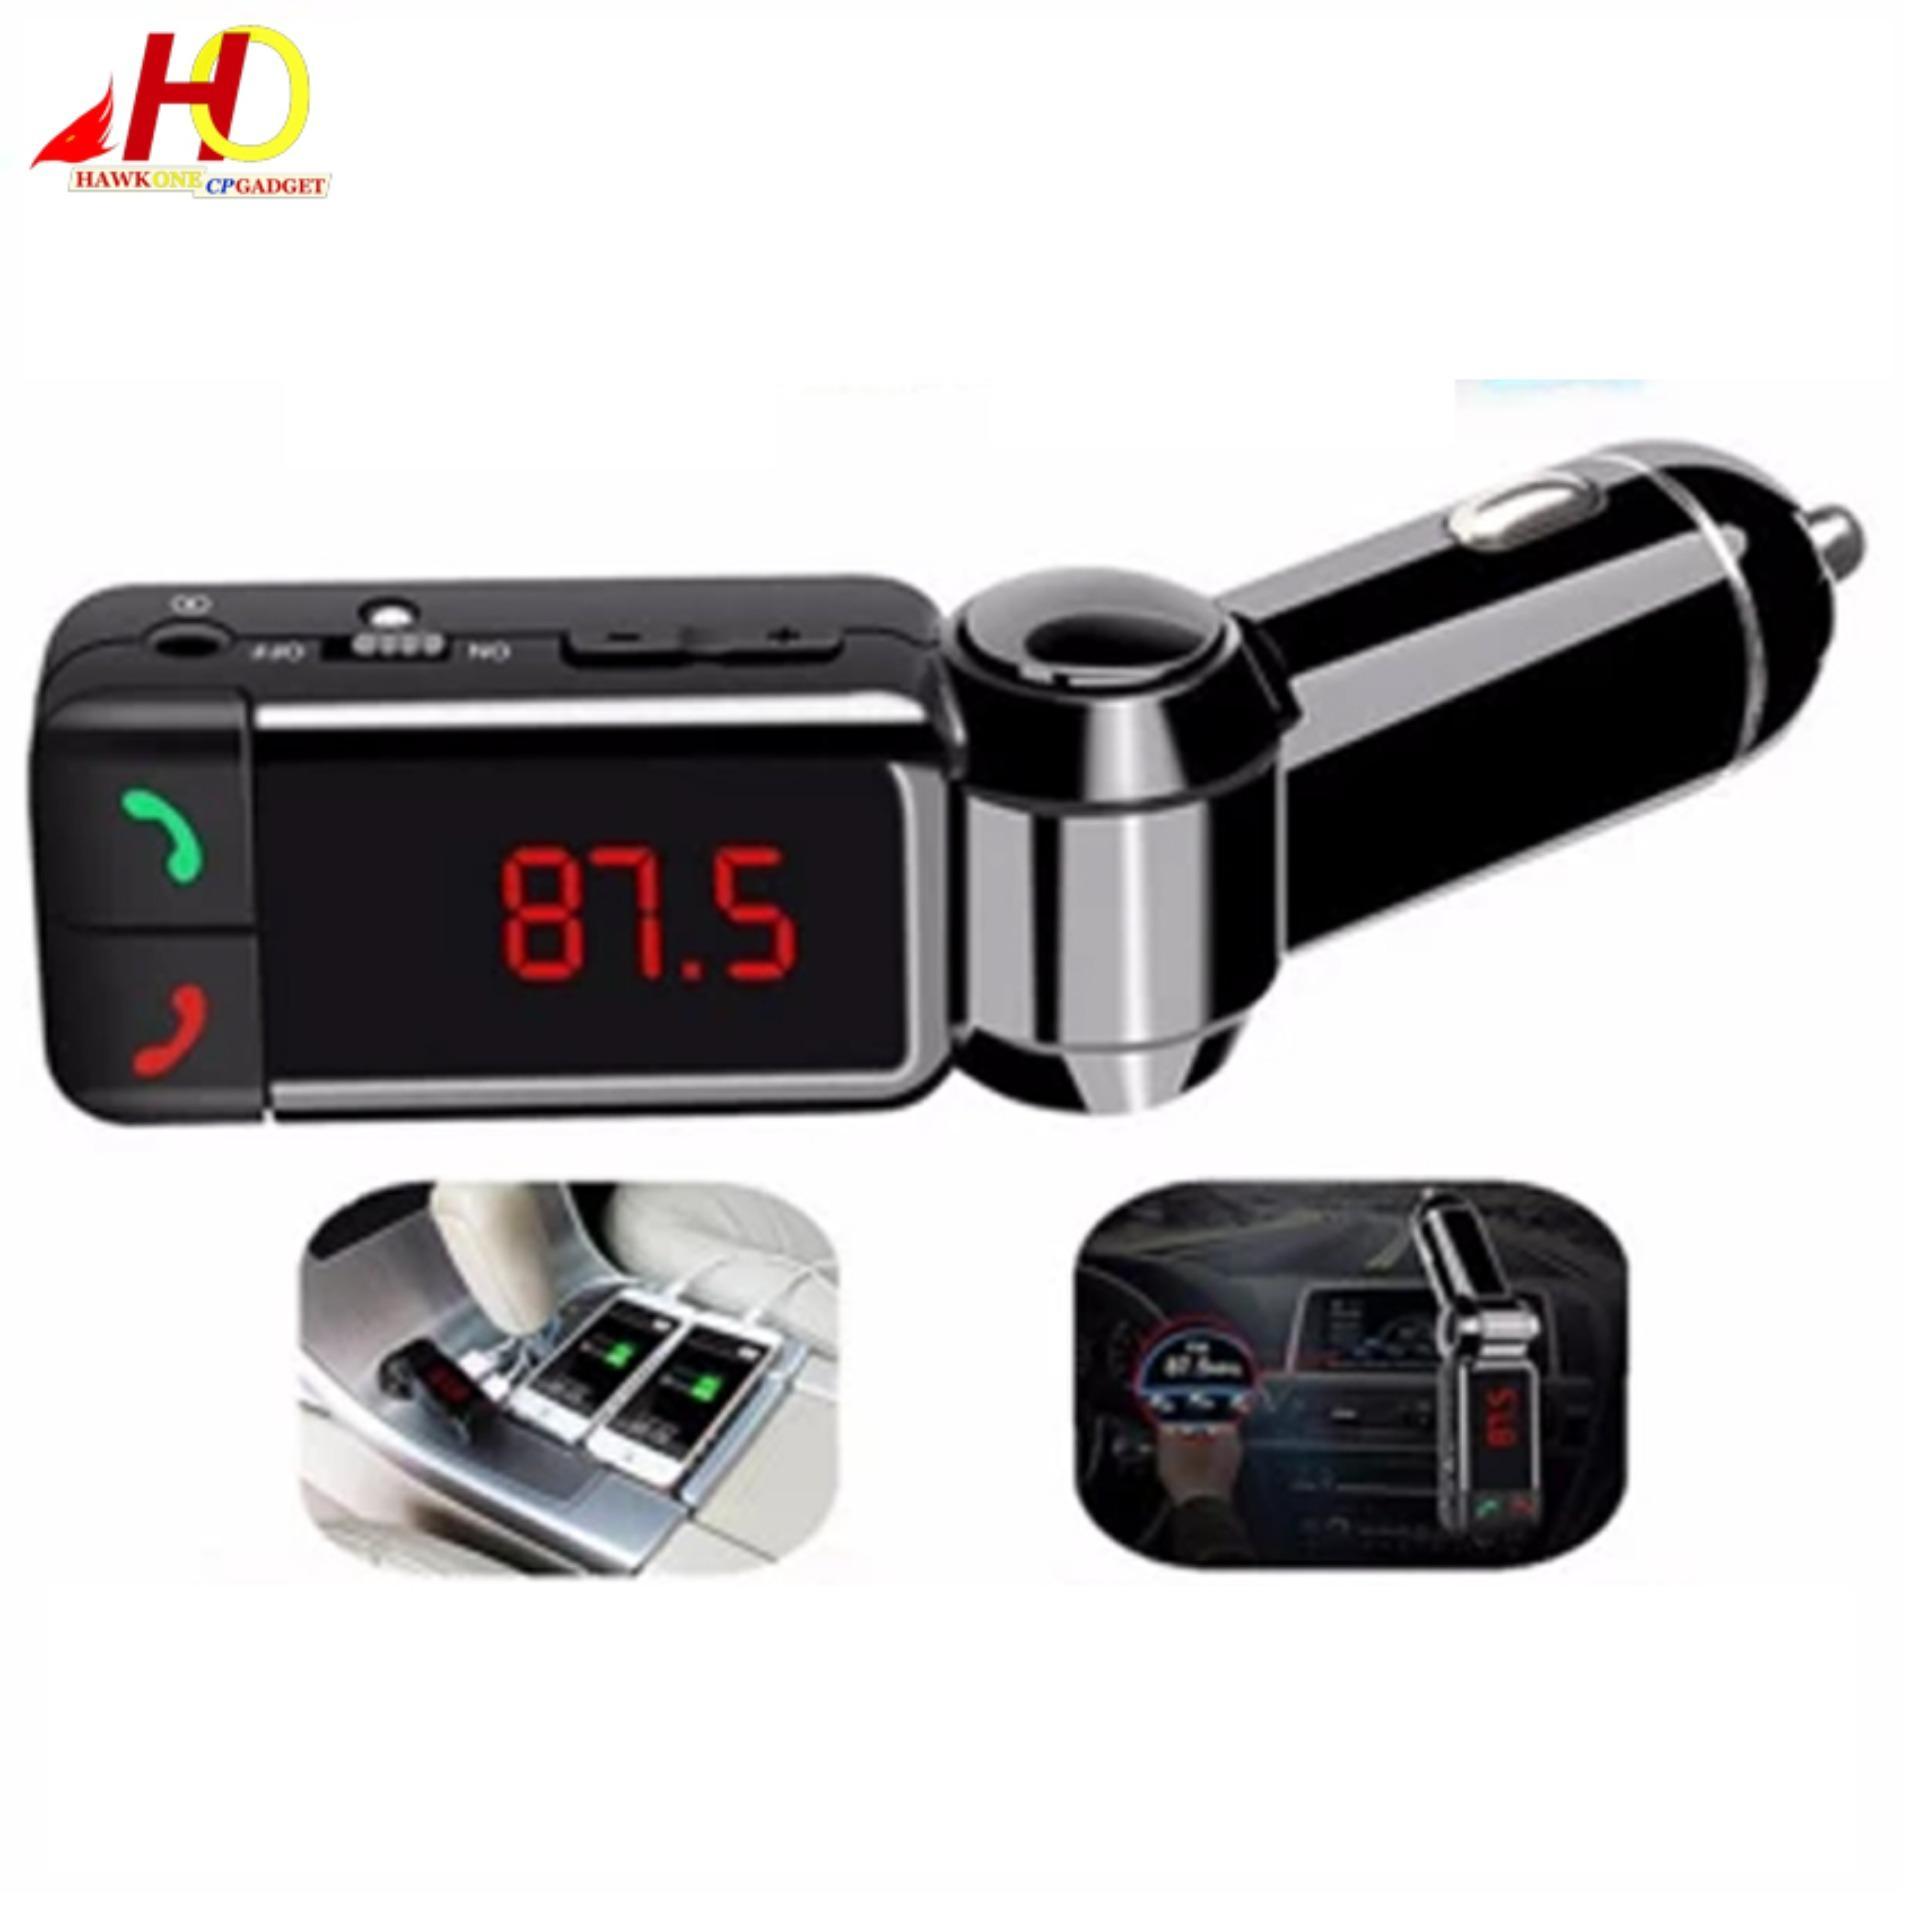 bc06 wireless bluetooth car charger fm transmitter led display modulator car kit mp3 player usb